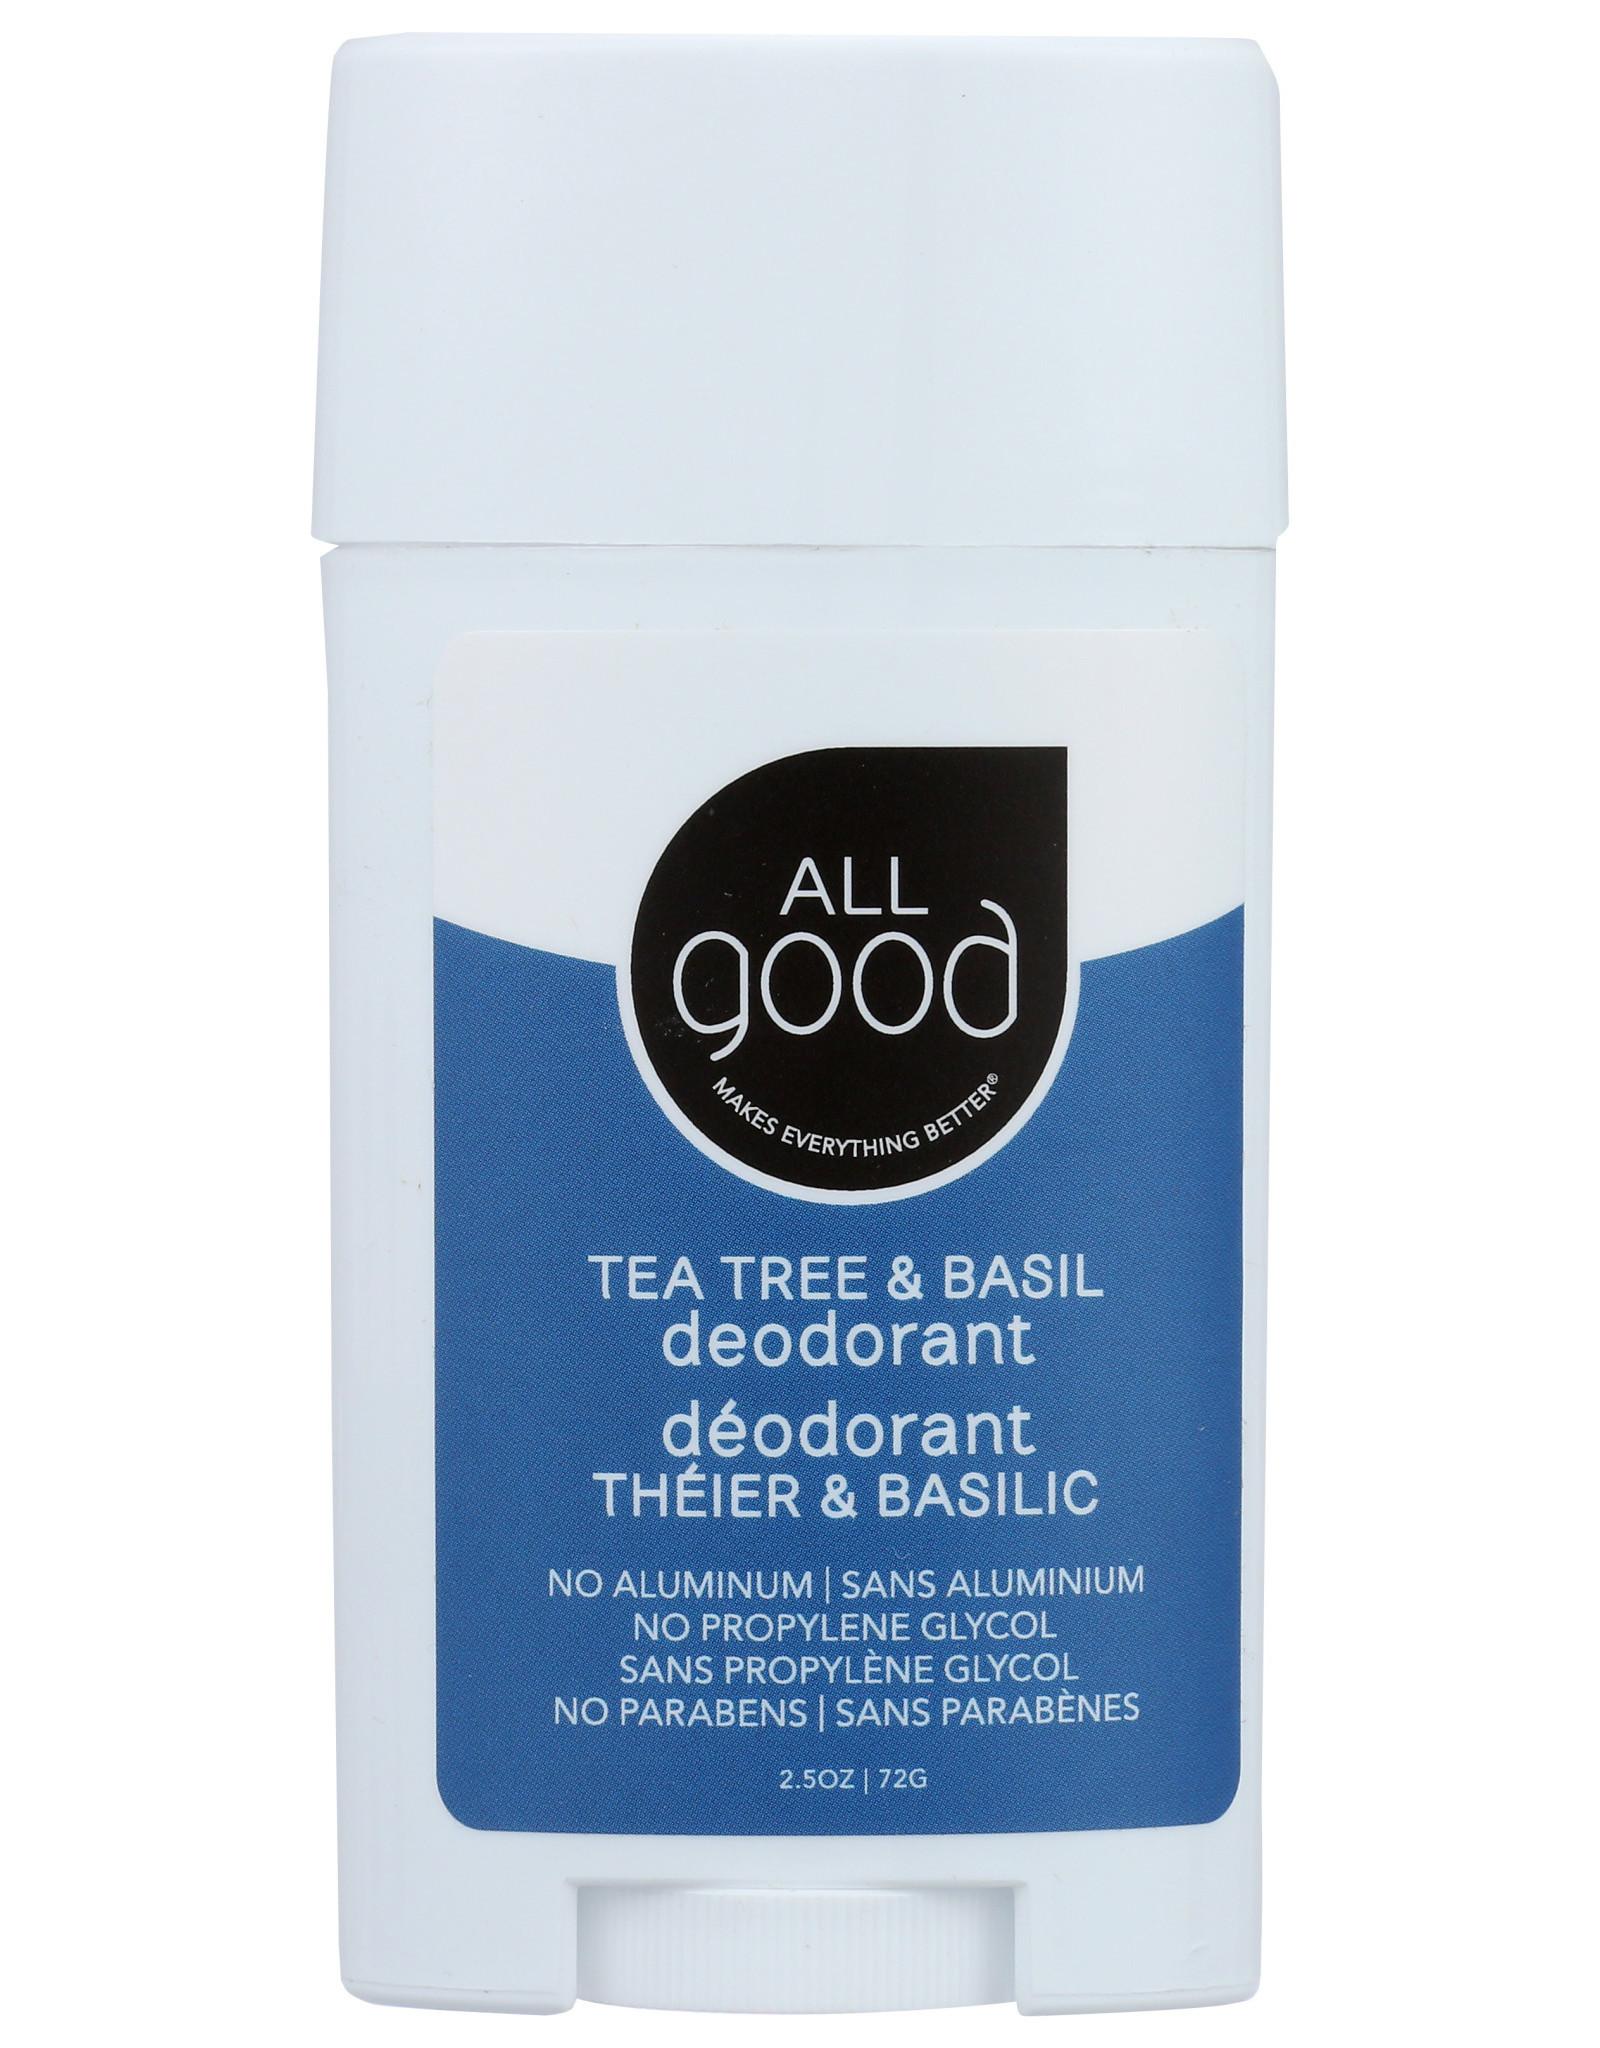 All Good Tea Tree & Basil Deoderant